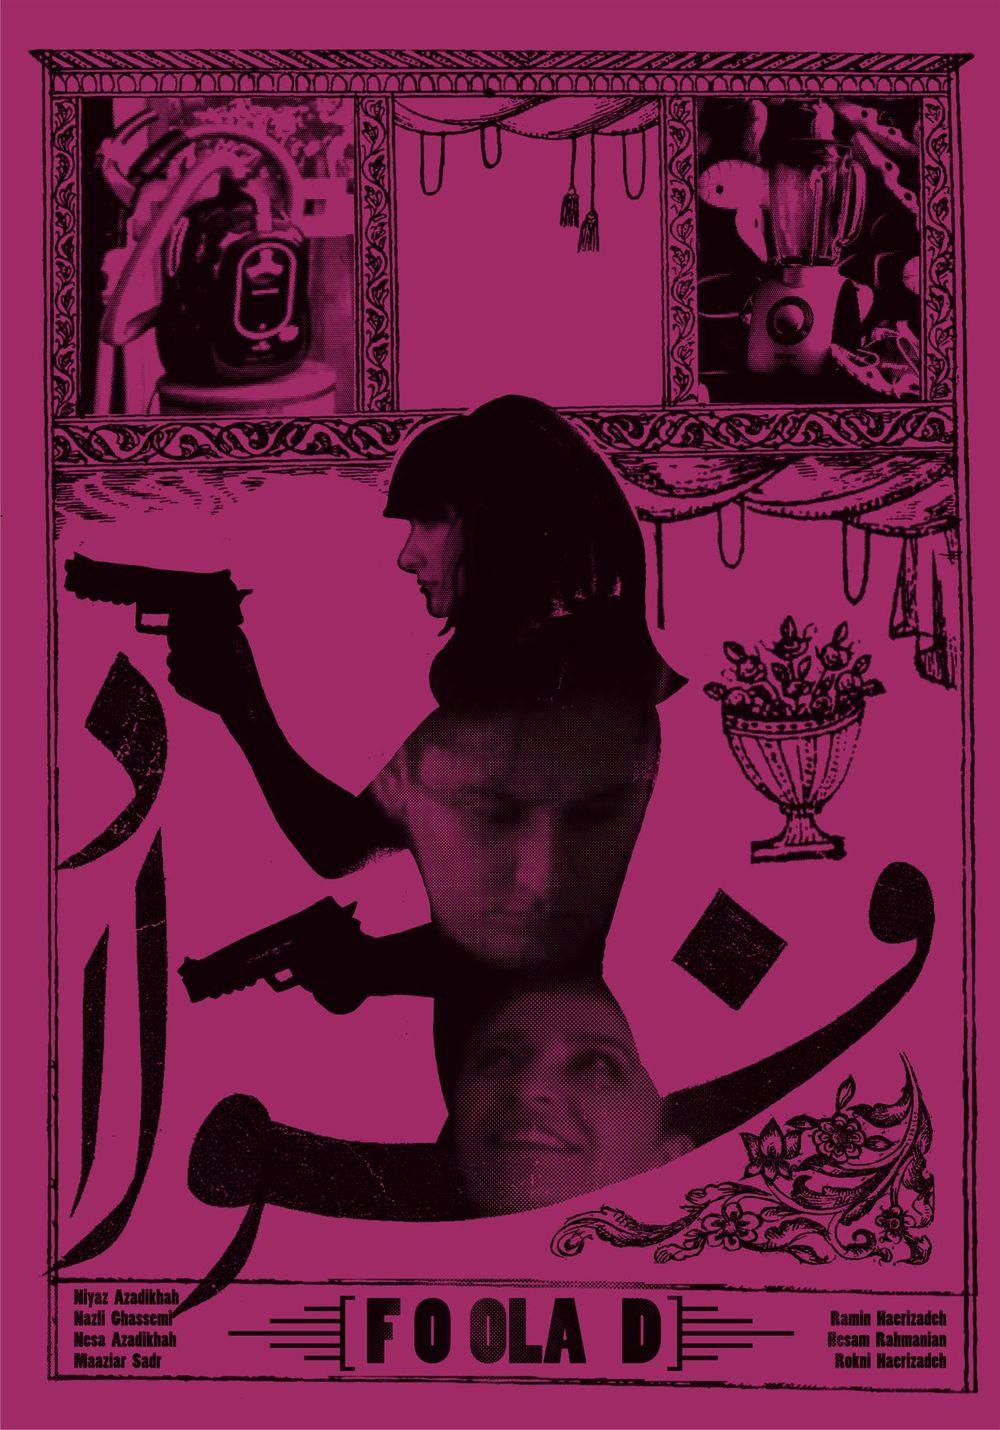 poster-rgb (2).jpg